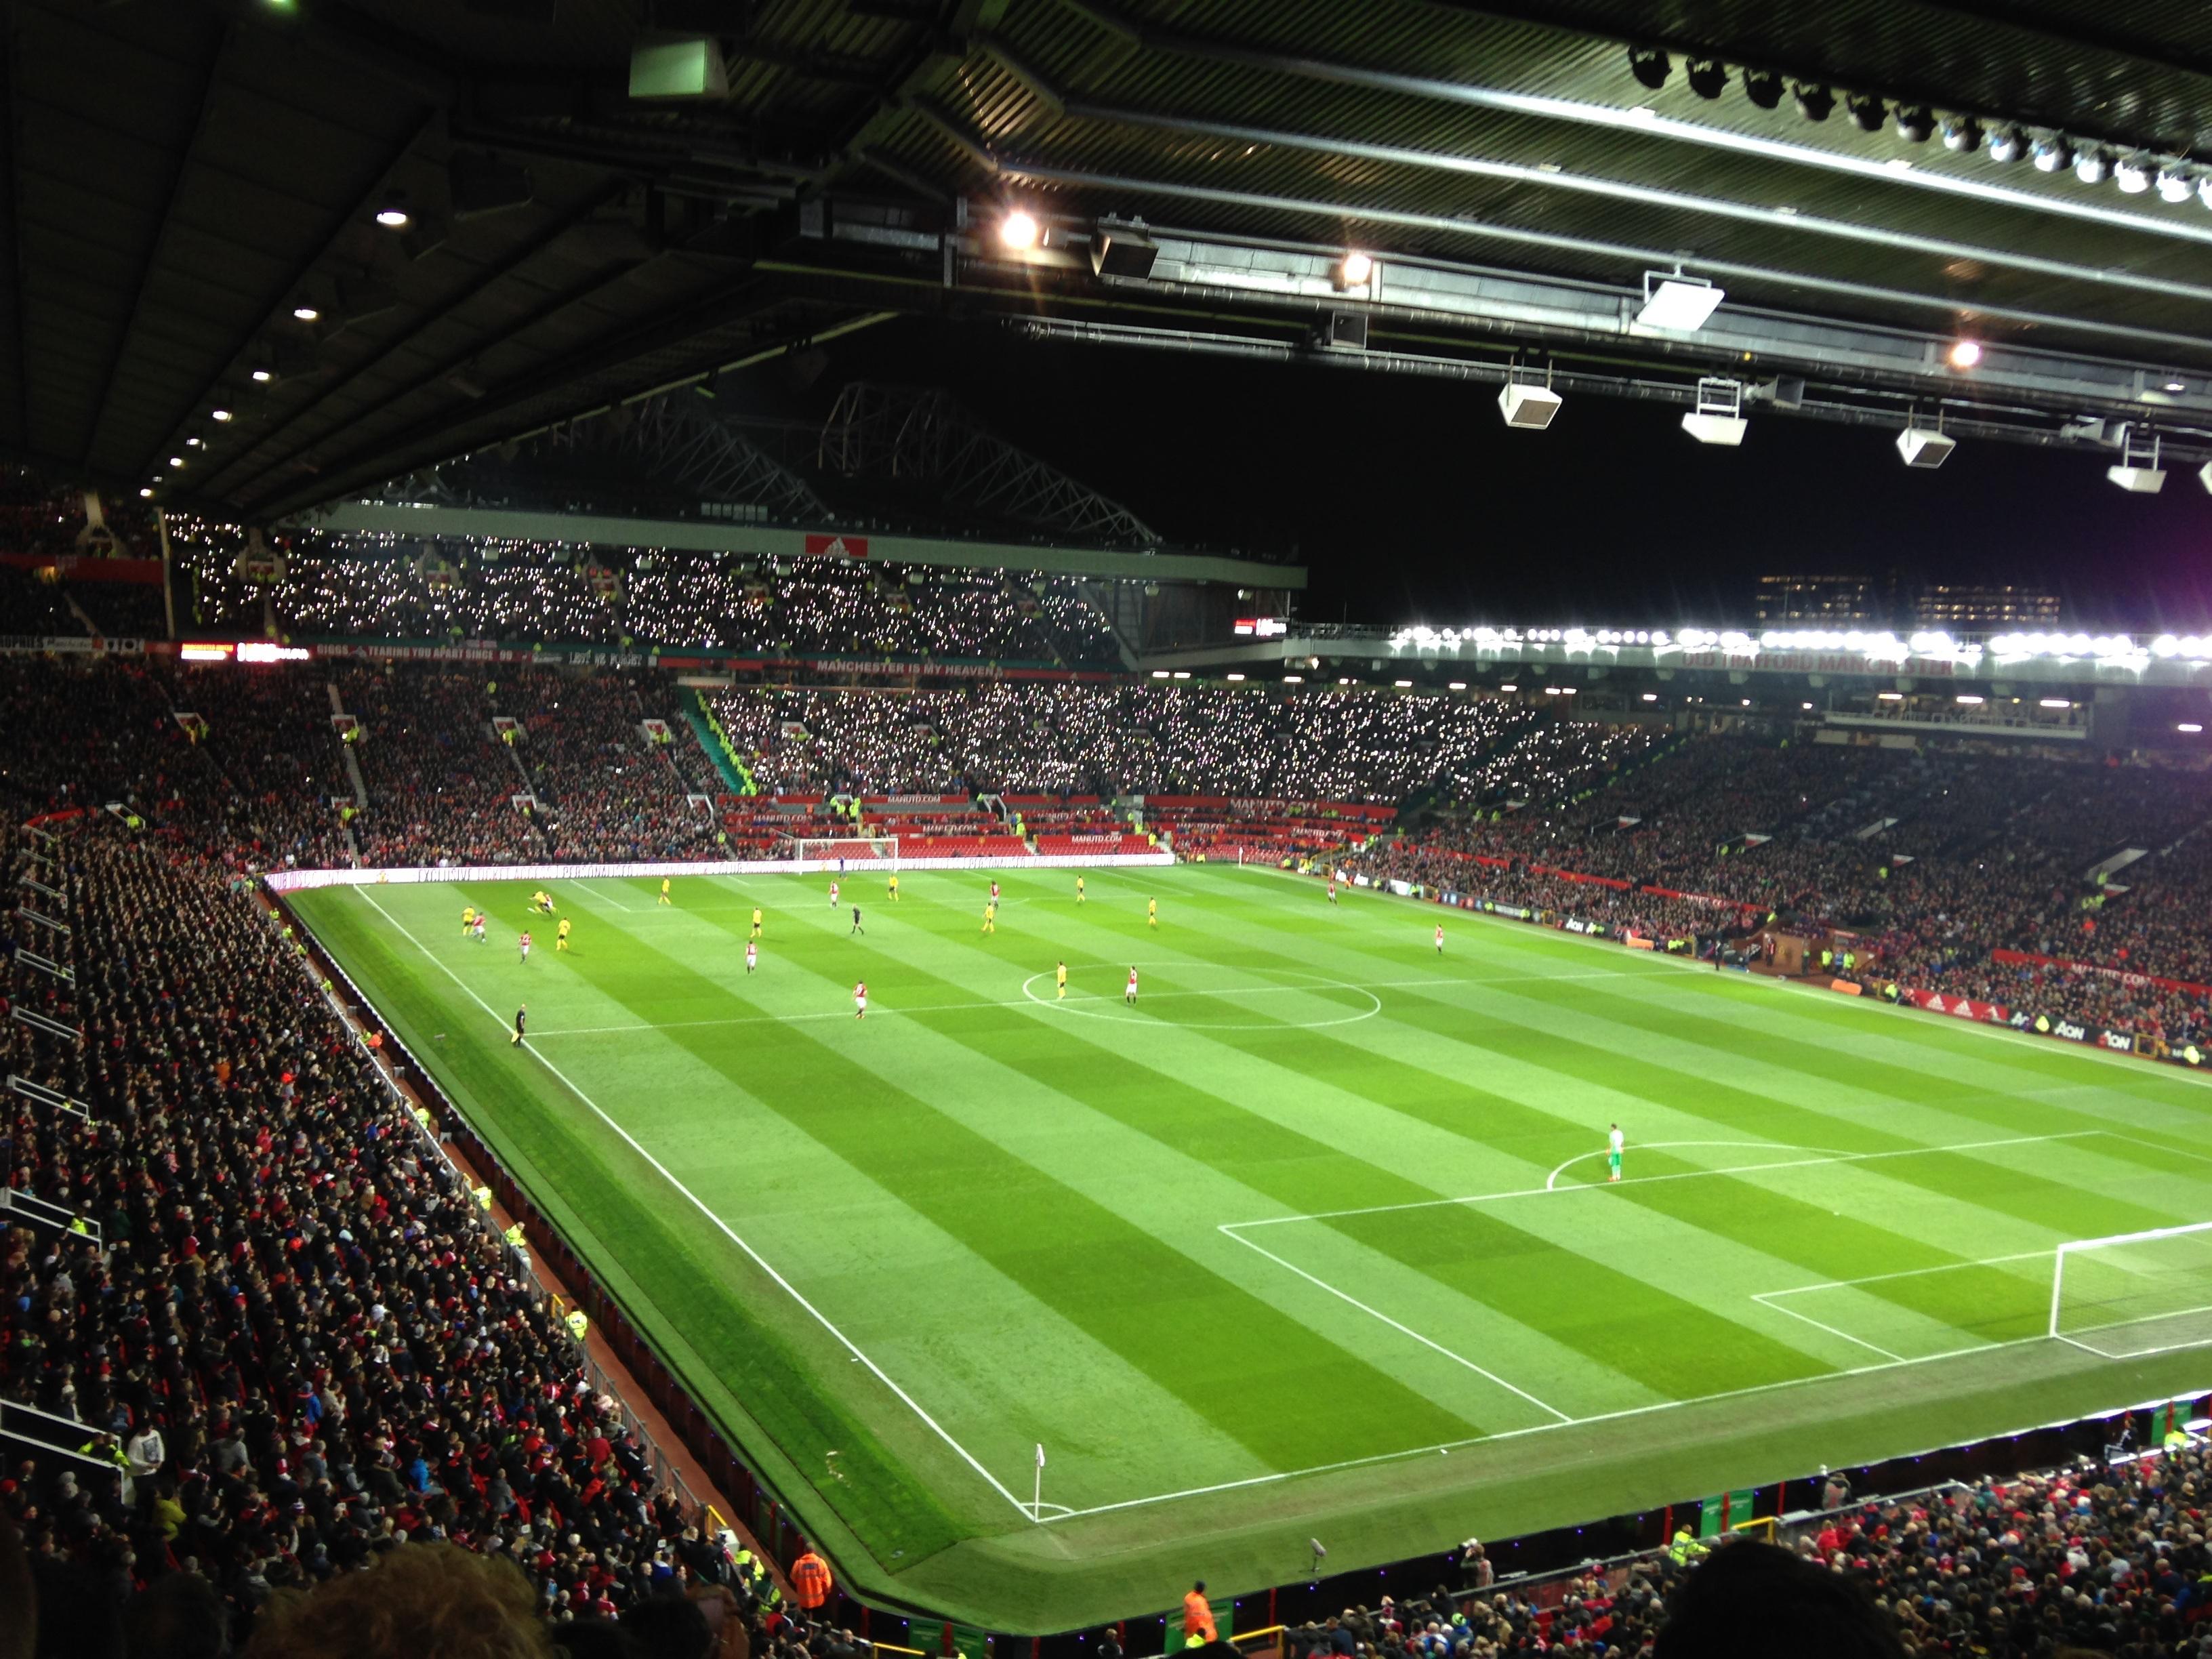 Gambar Struktur Tanah Sepak Bola Pemain Lapangan